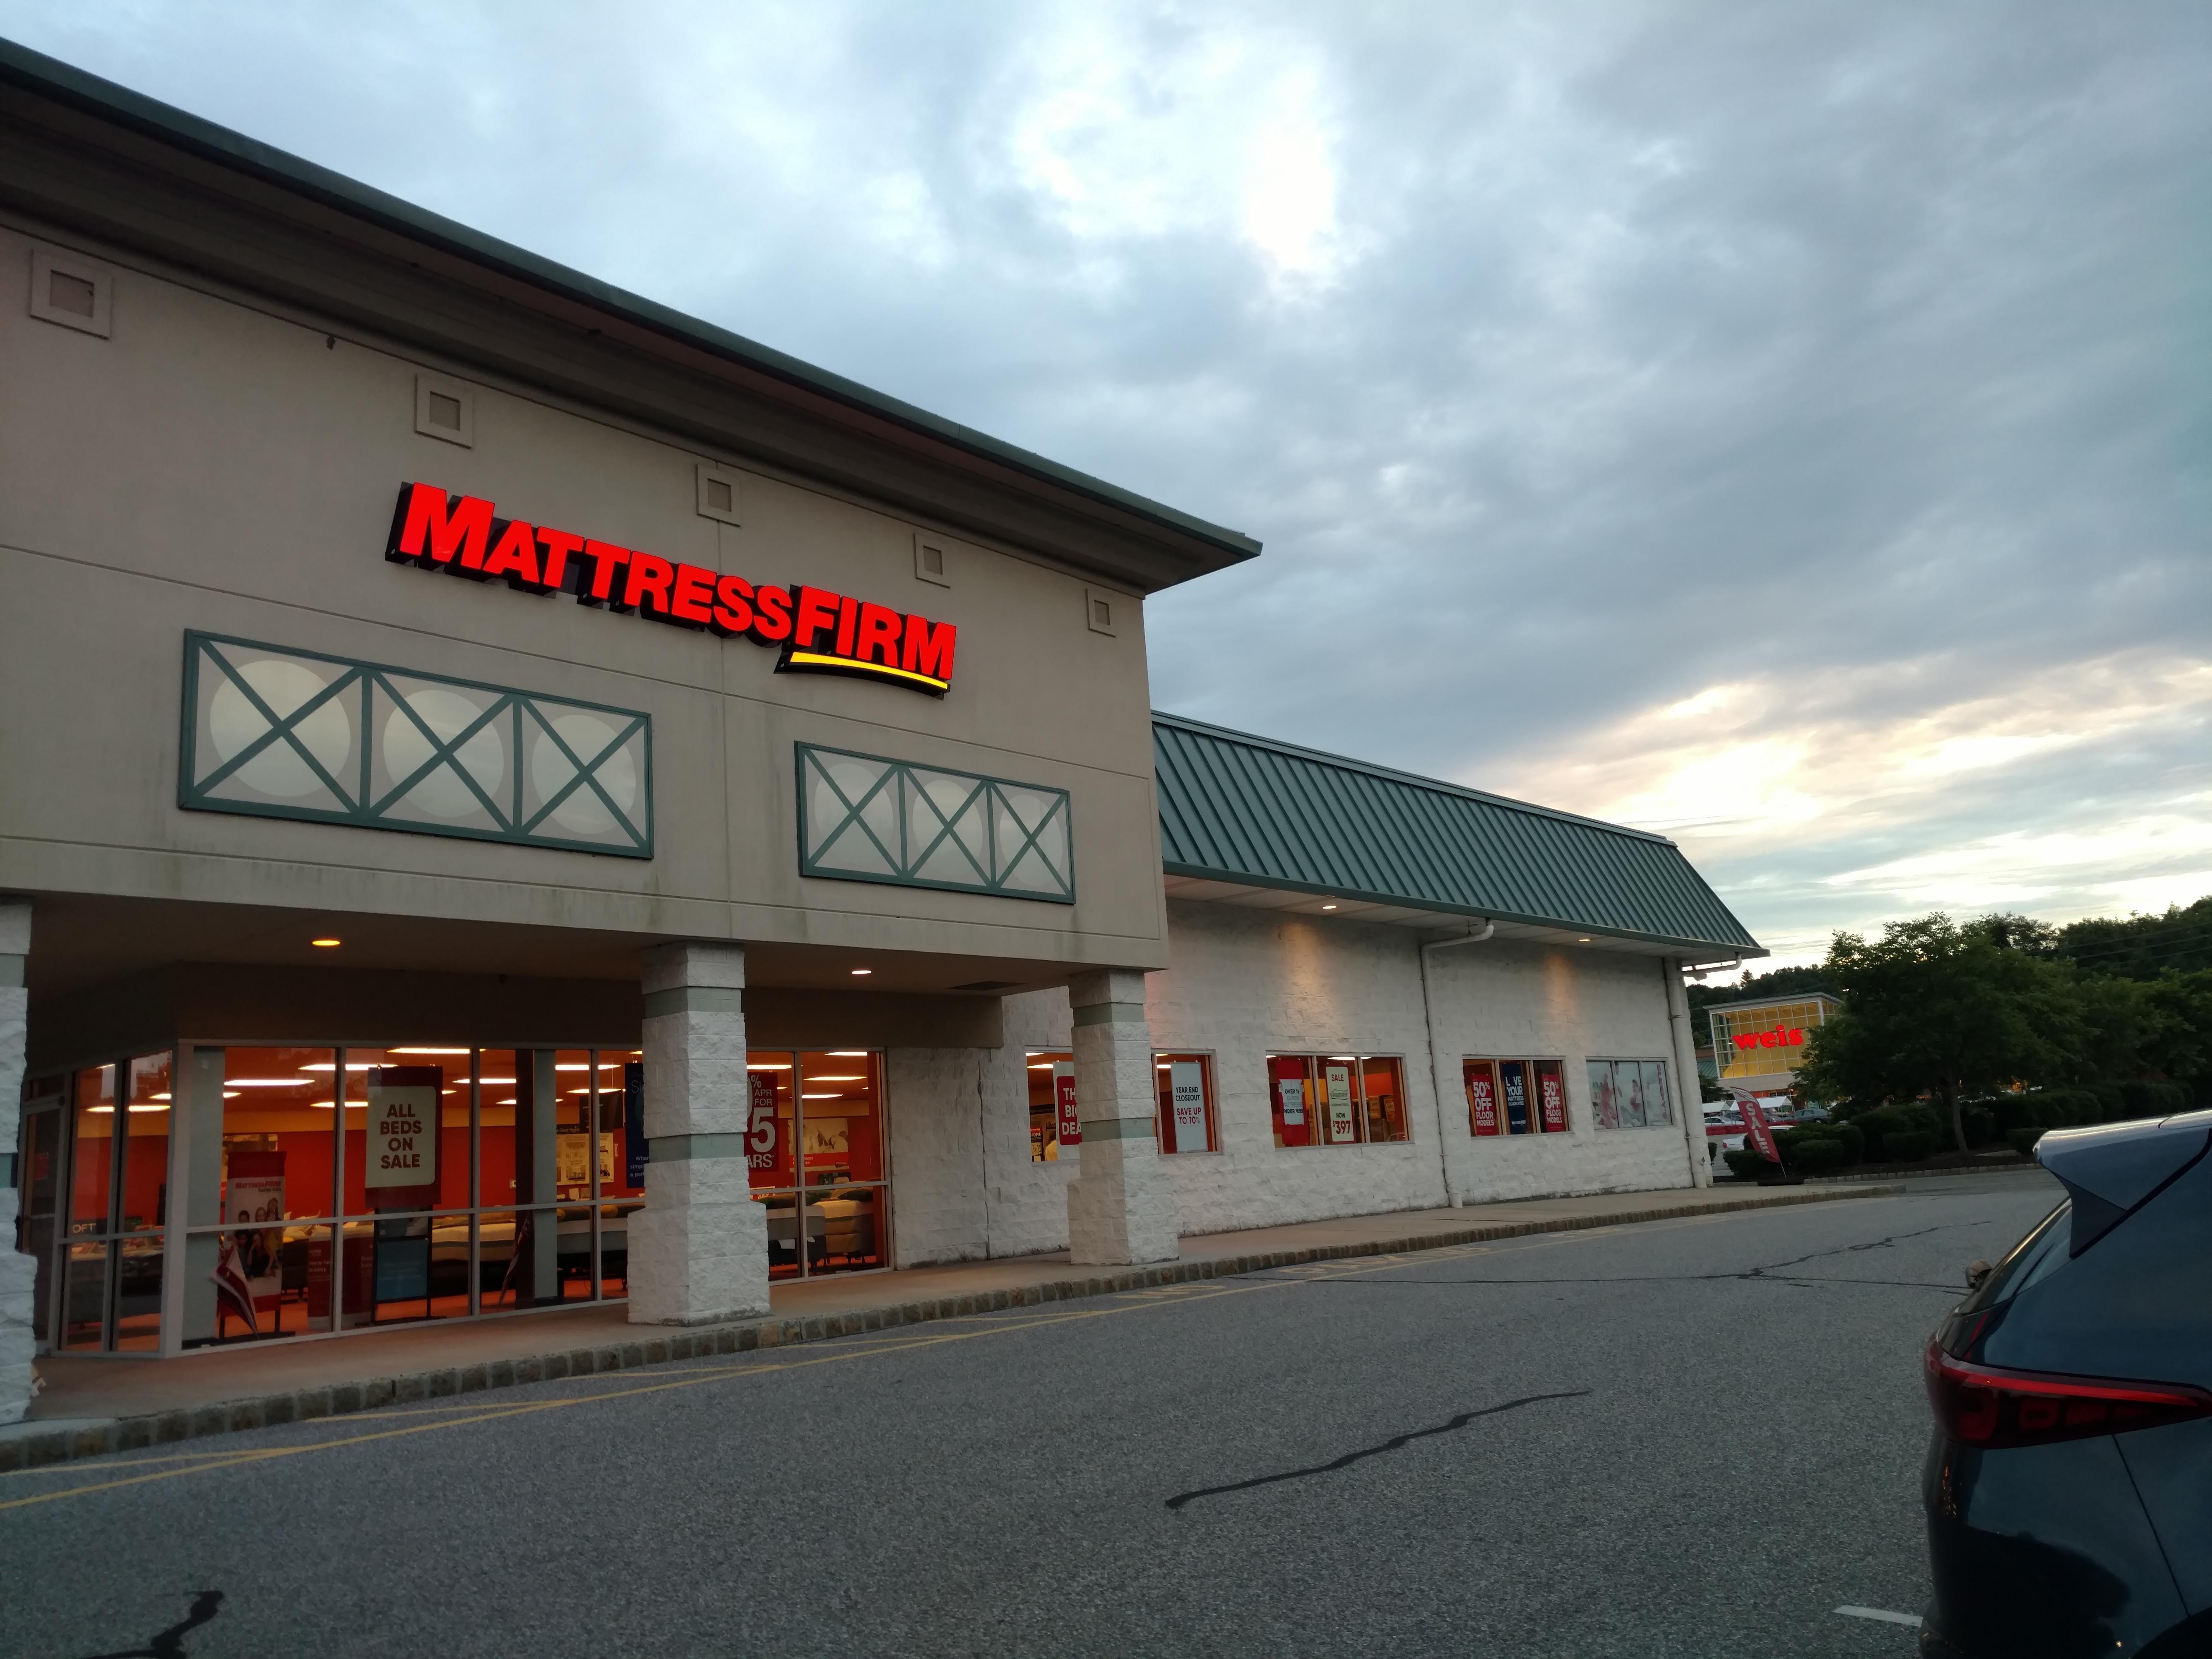 Mattress Firm Mansfield image 5